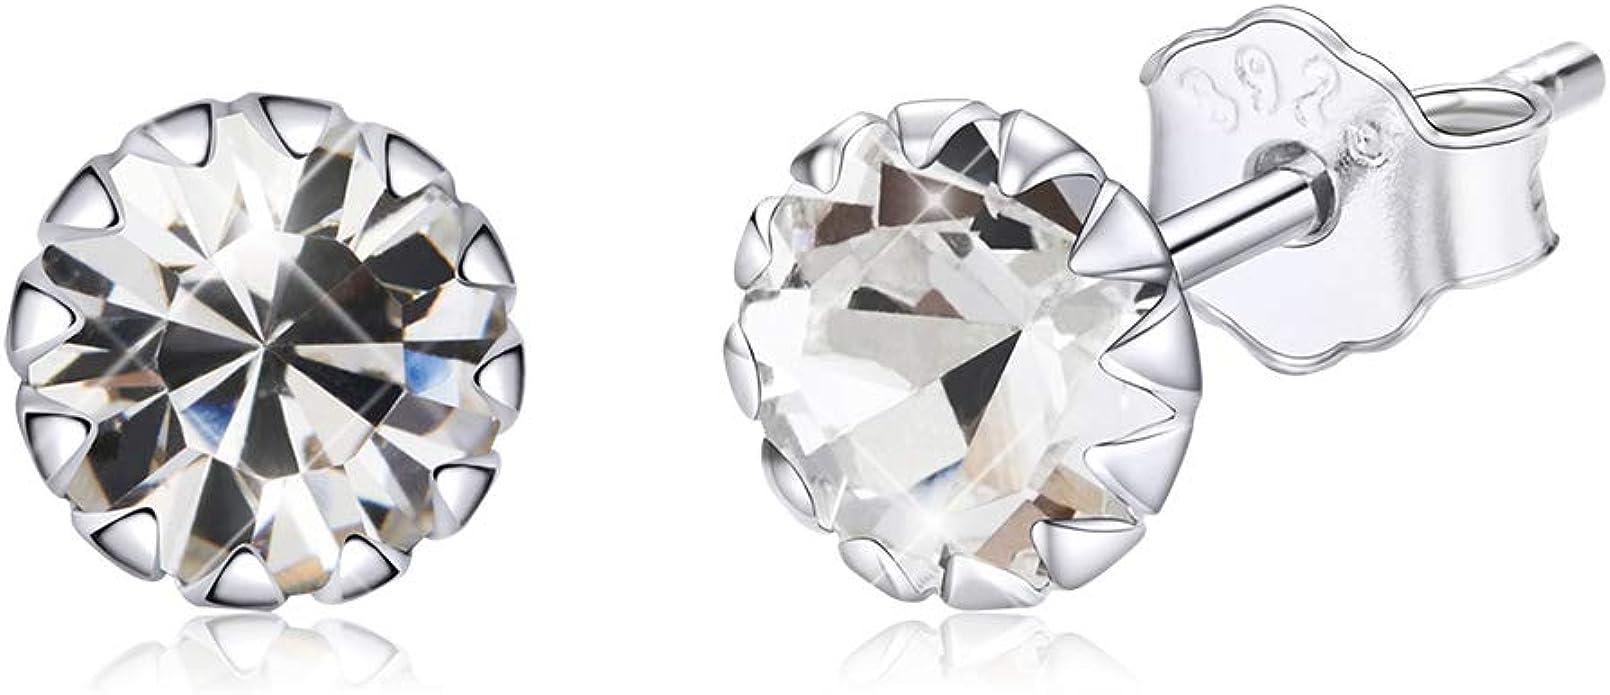 Sterling Silver Earrings April birthstone Earrings for women Earrings Silver Earrings